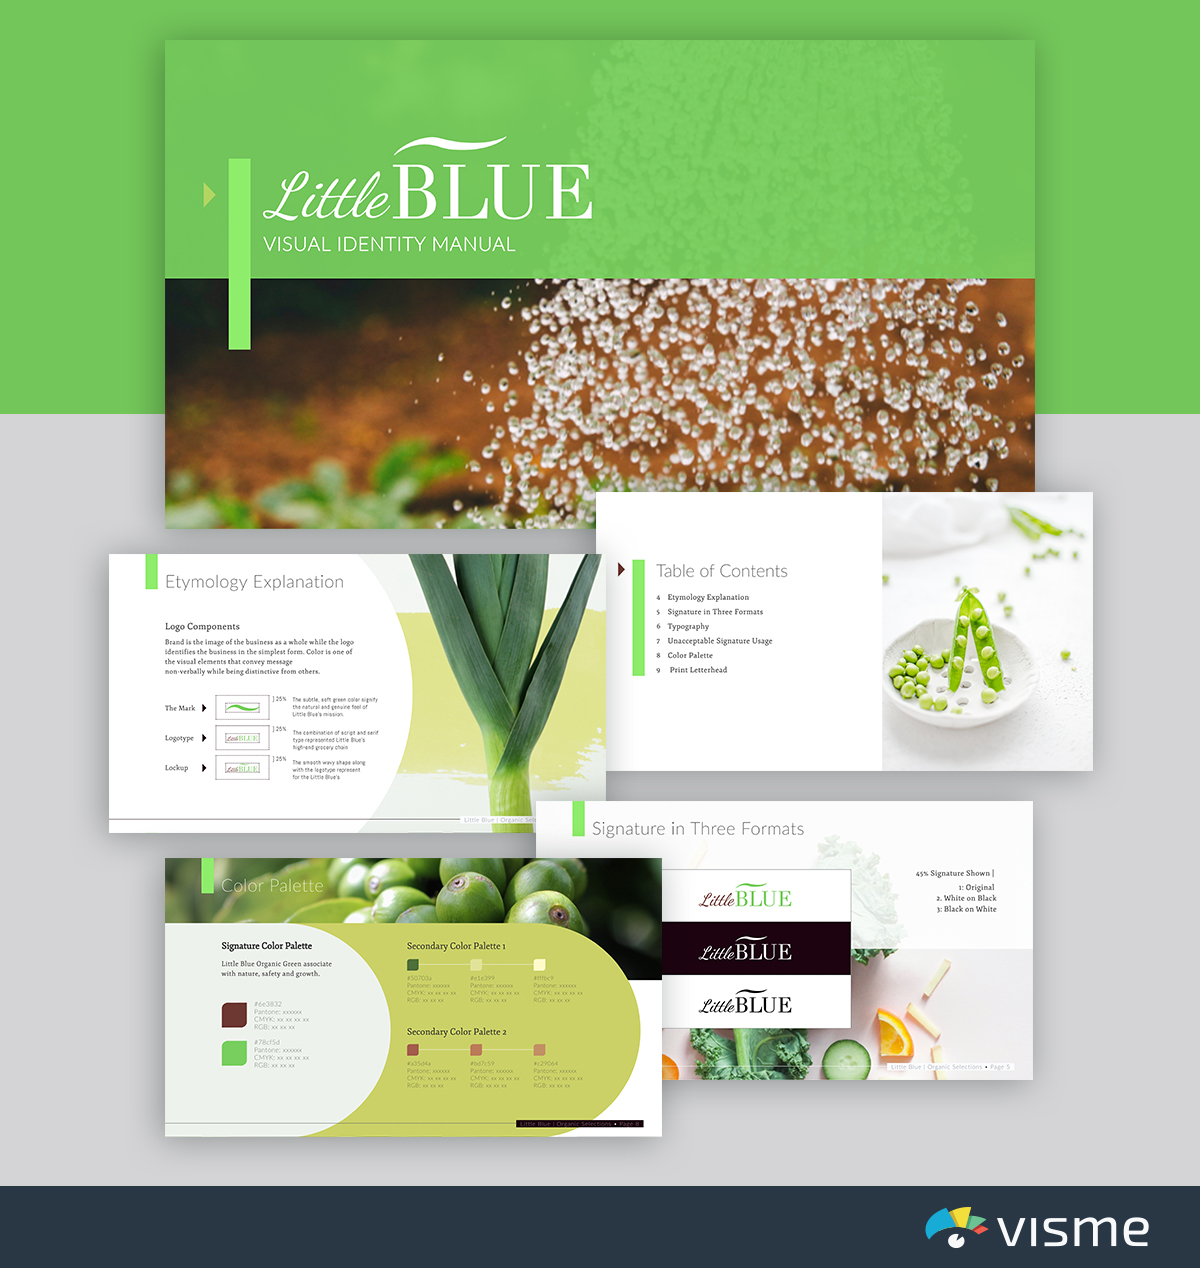 best presentation templates - littlebluebrand guidelines visme